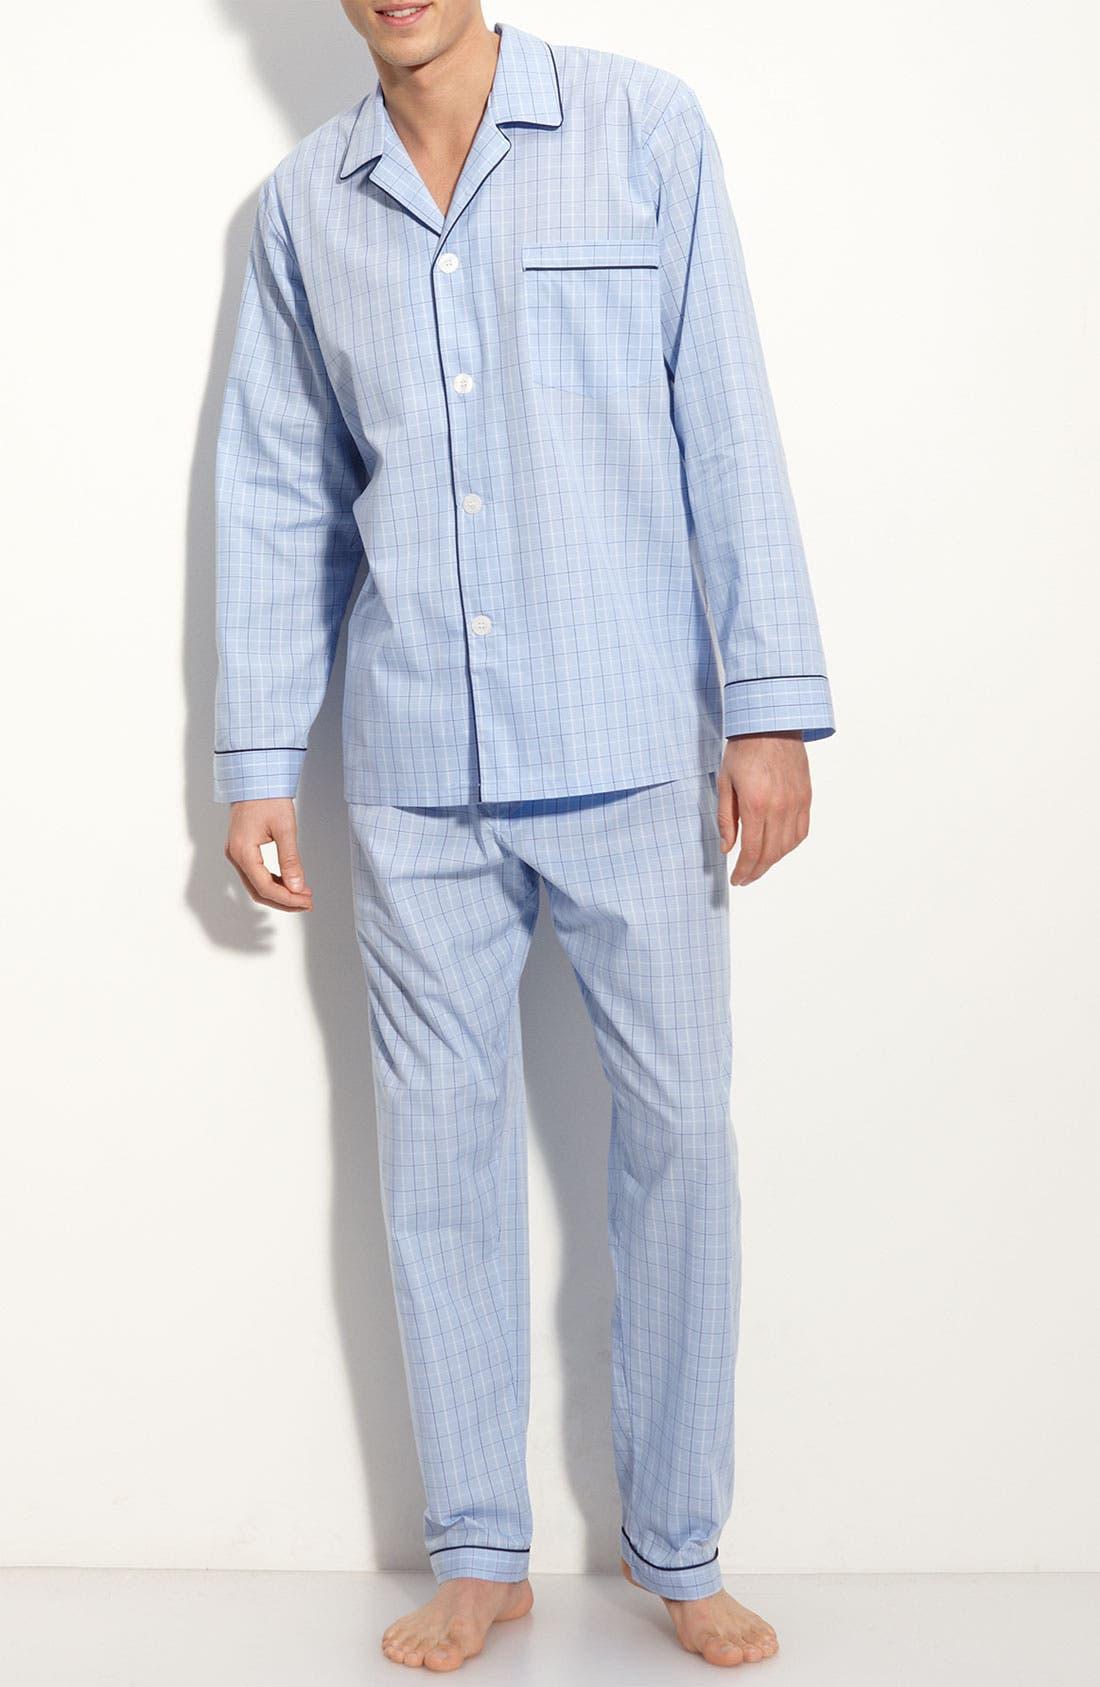 Cotton Pajamas,                             Main thumbnail 1, color,                             LIGHT BLUE CHECK